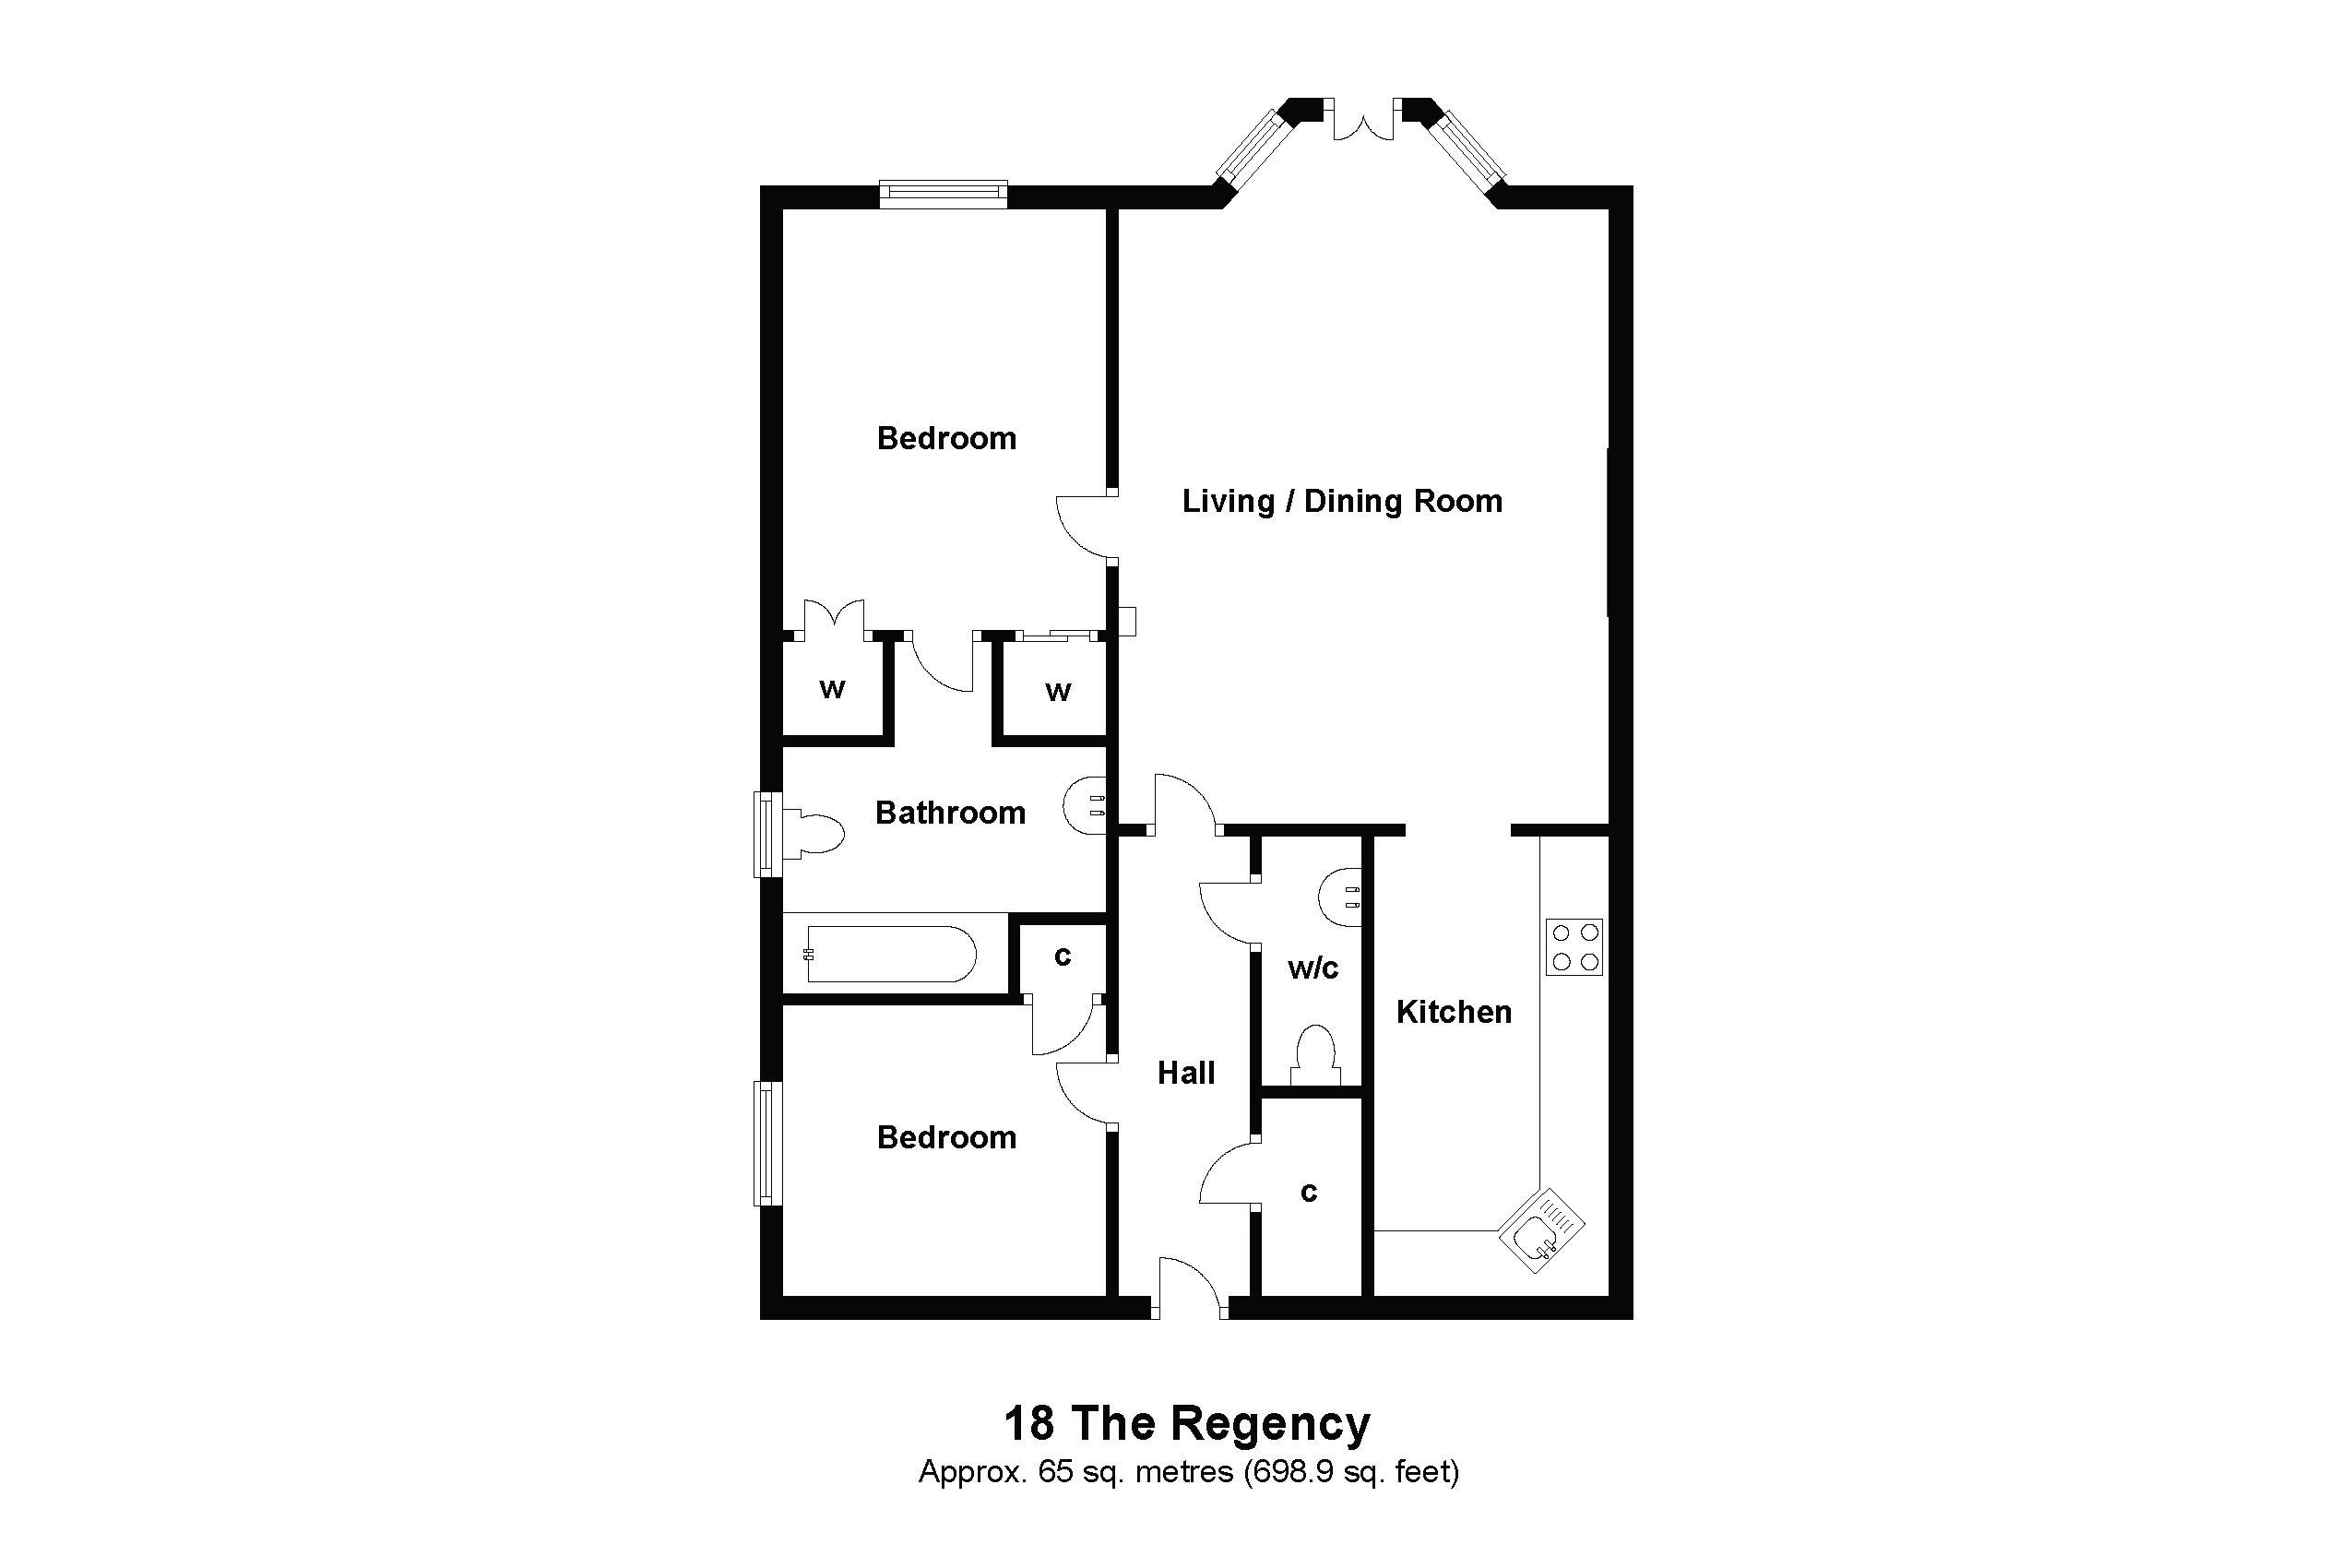 18 Regency Floorplan